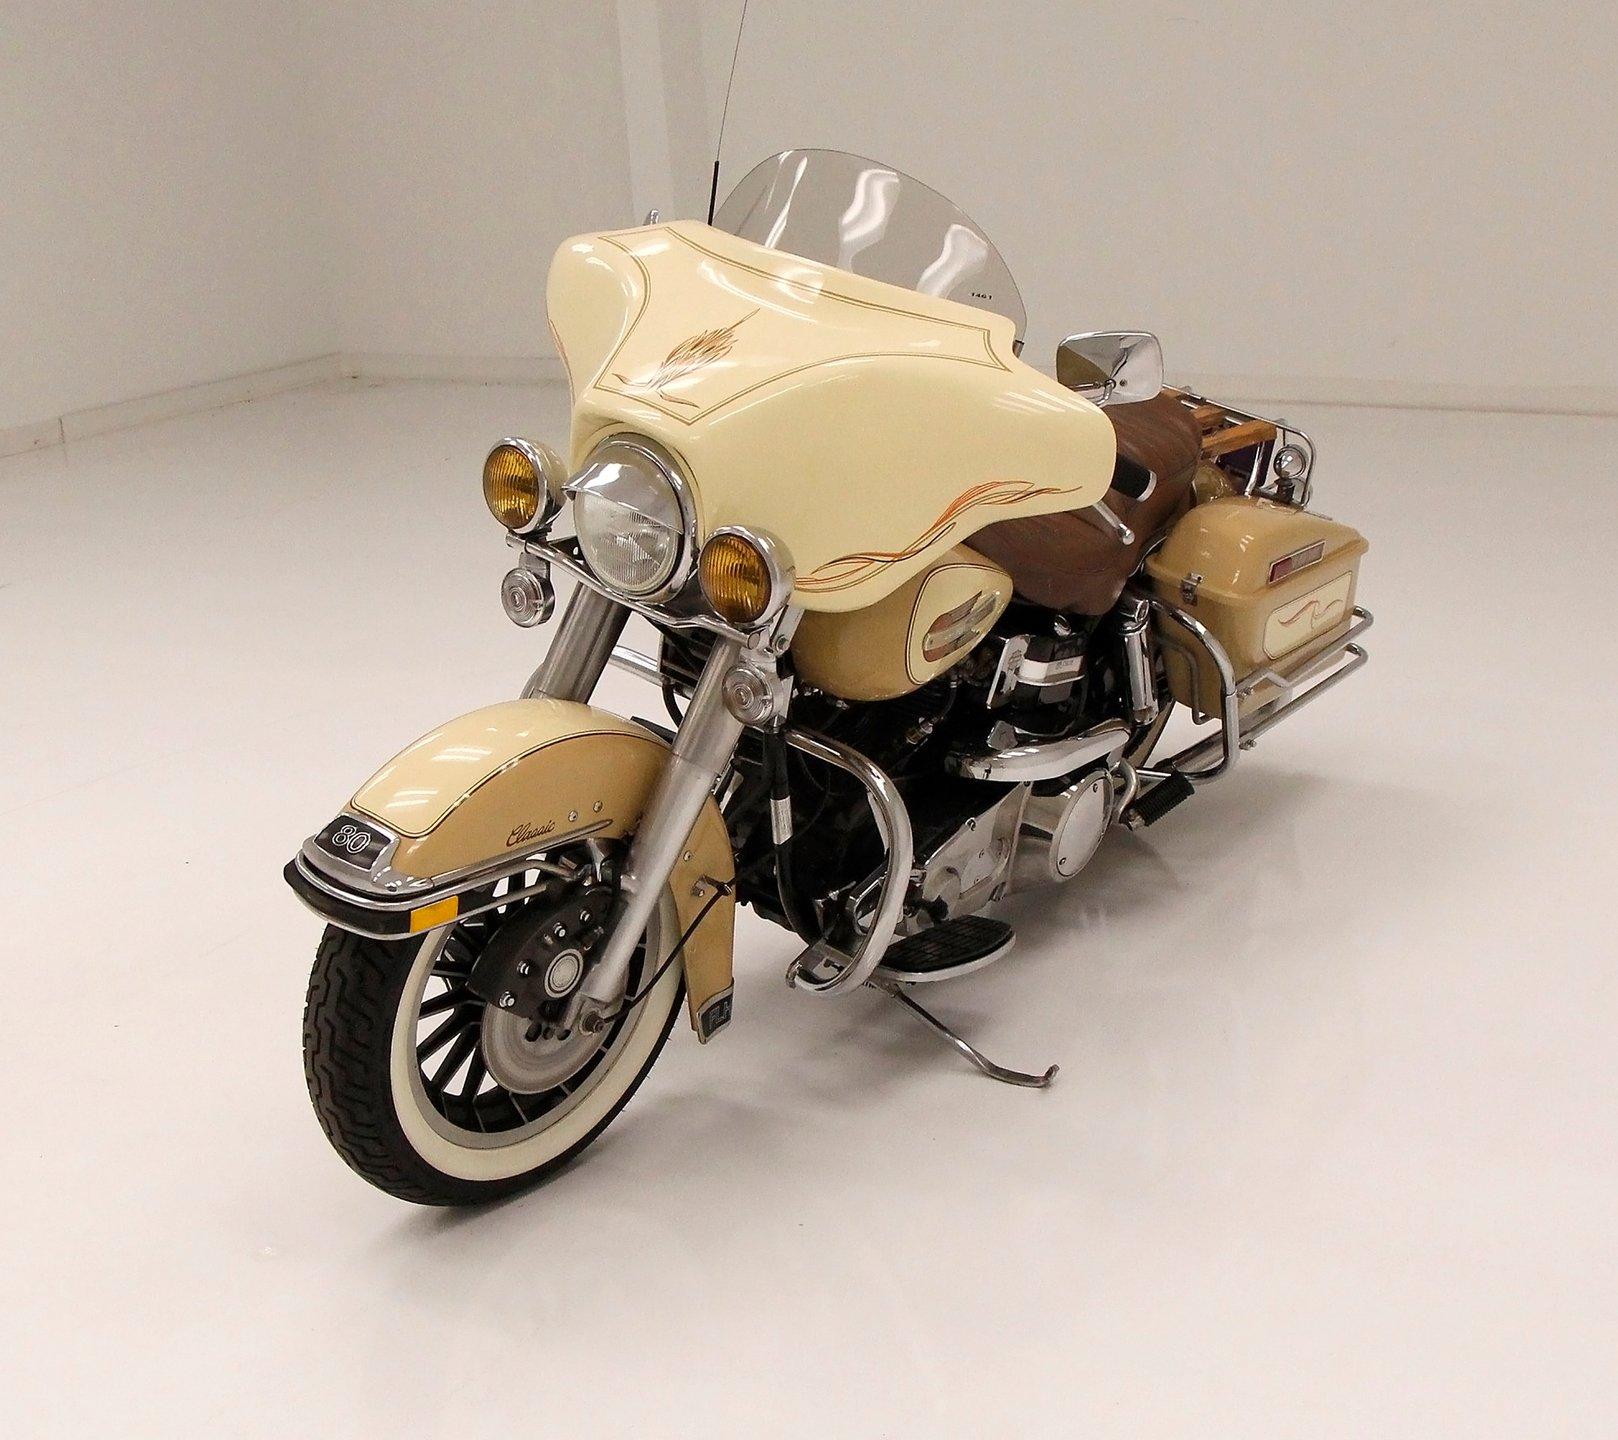 1979 Harley Davidson FLHC